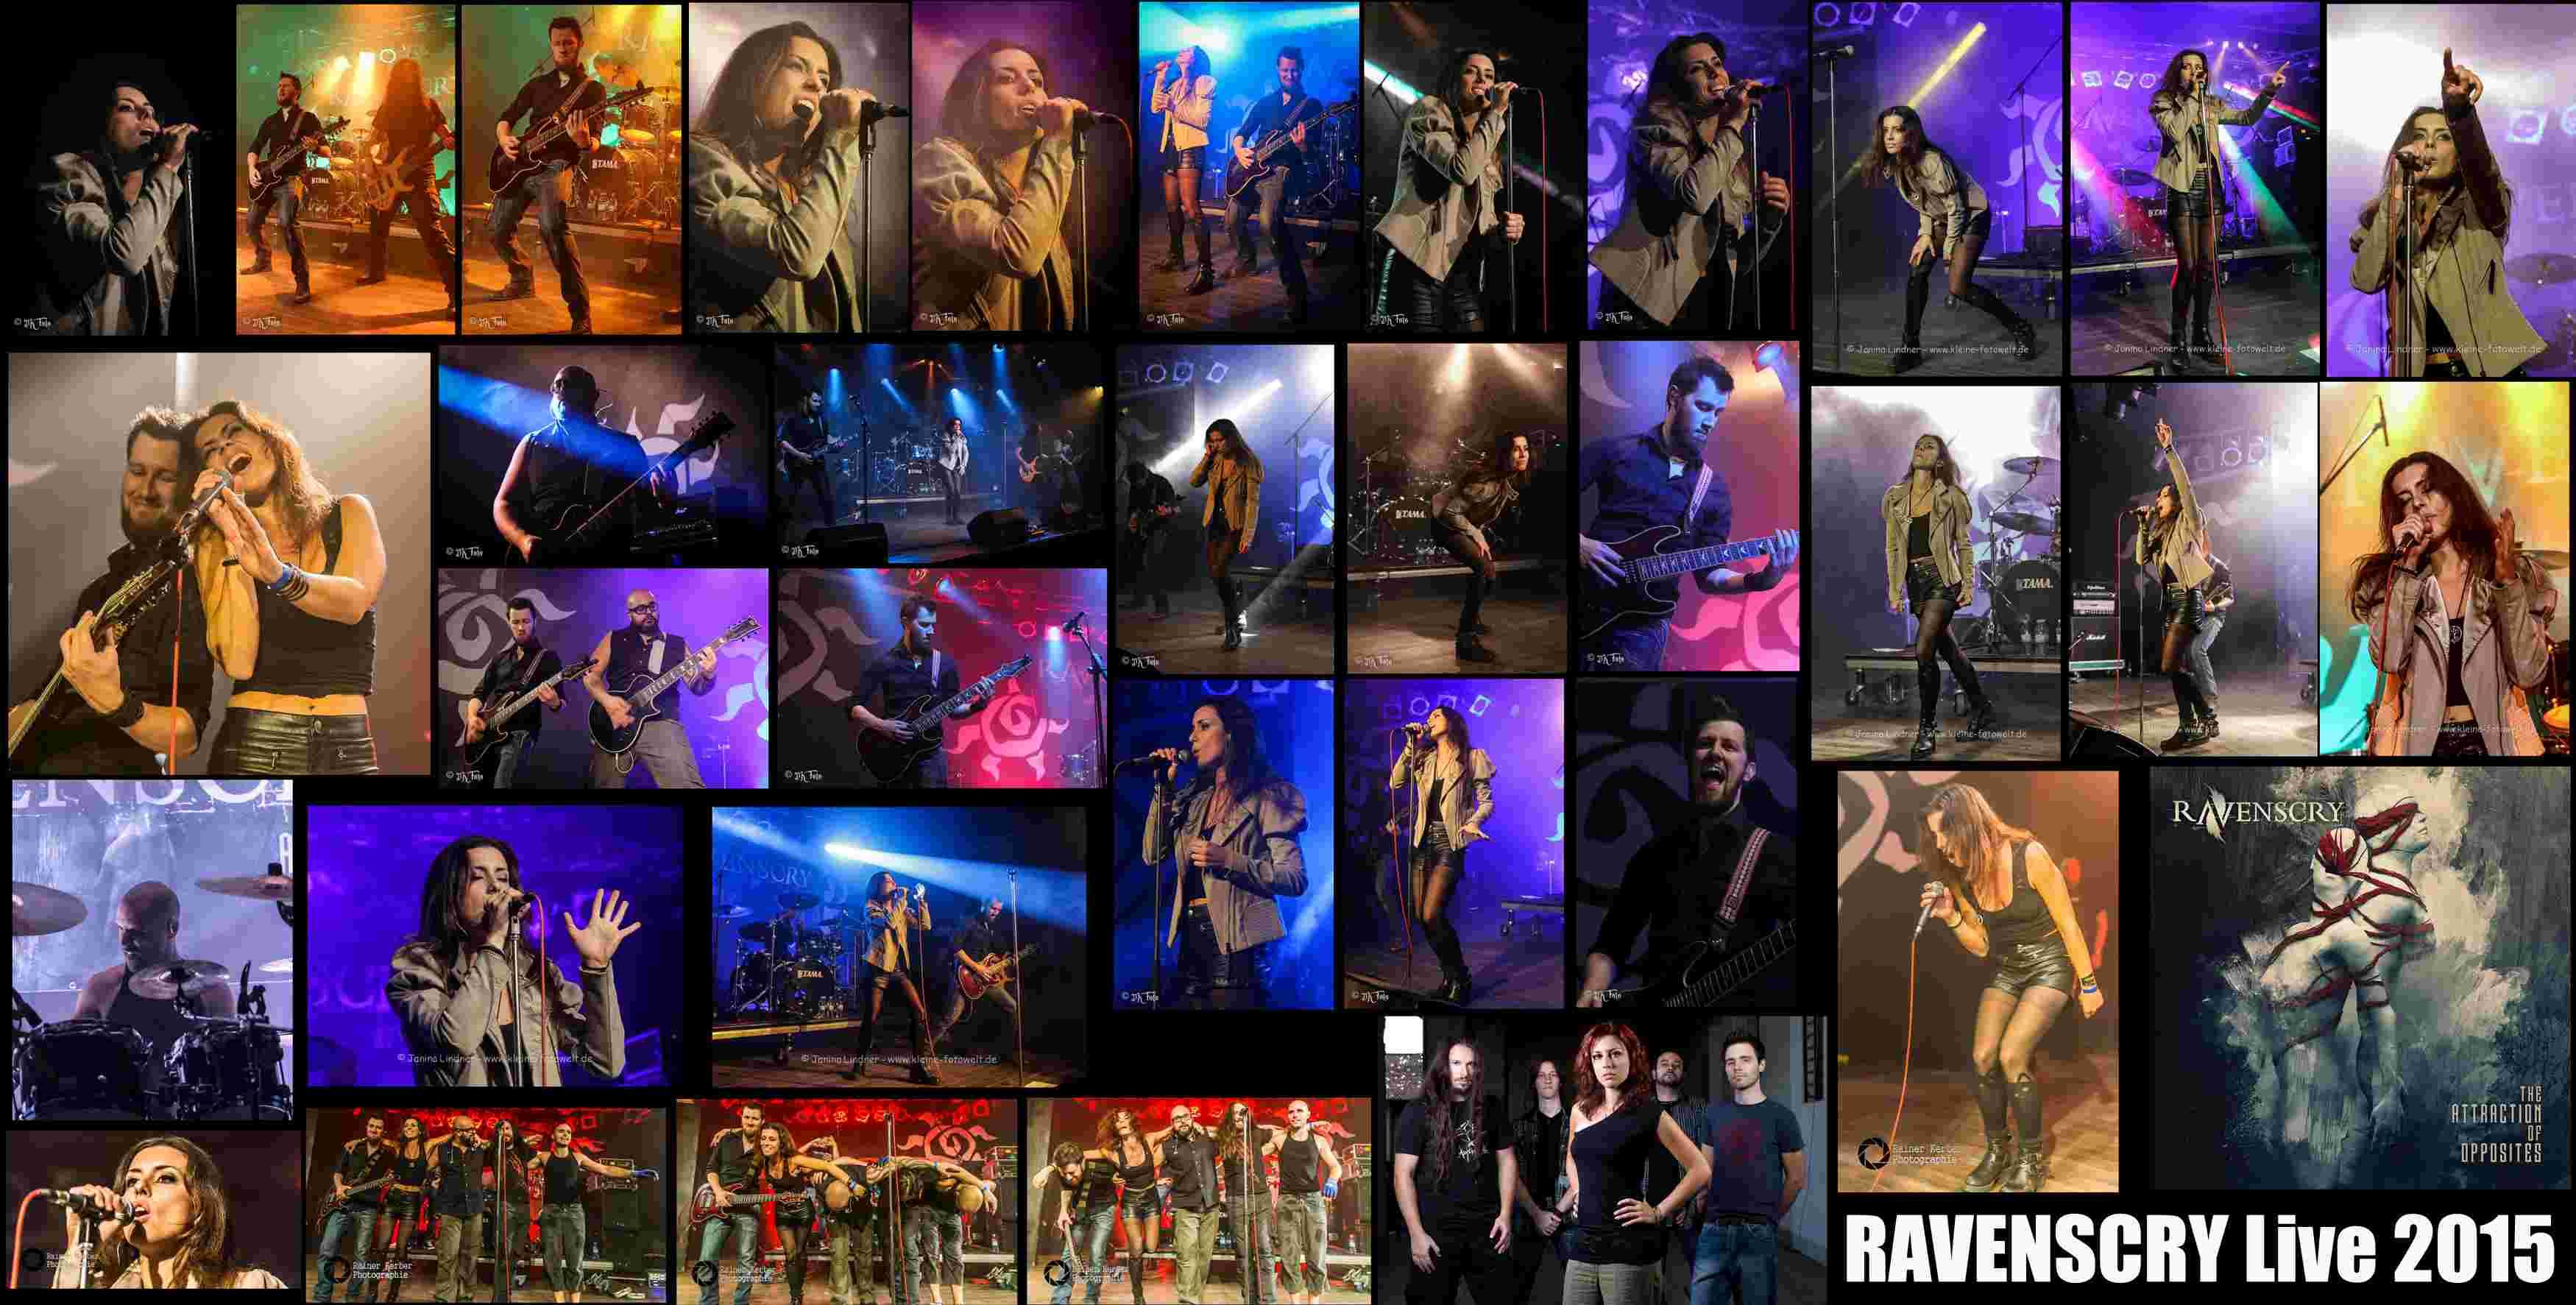 Mes petits montages photos ... - Page 8 Ravens11